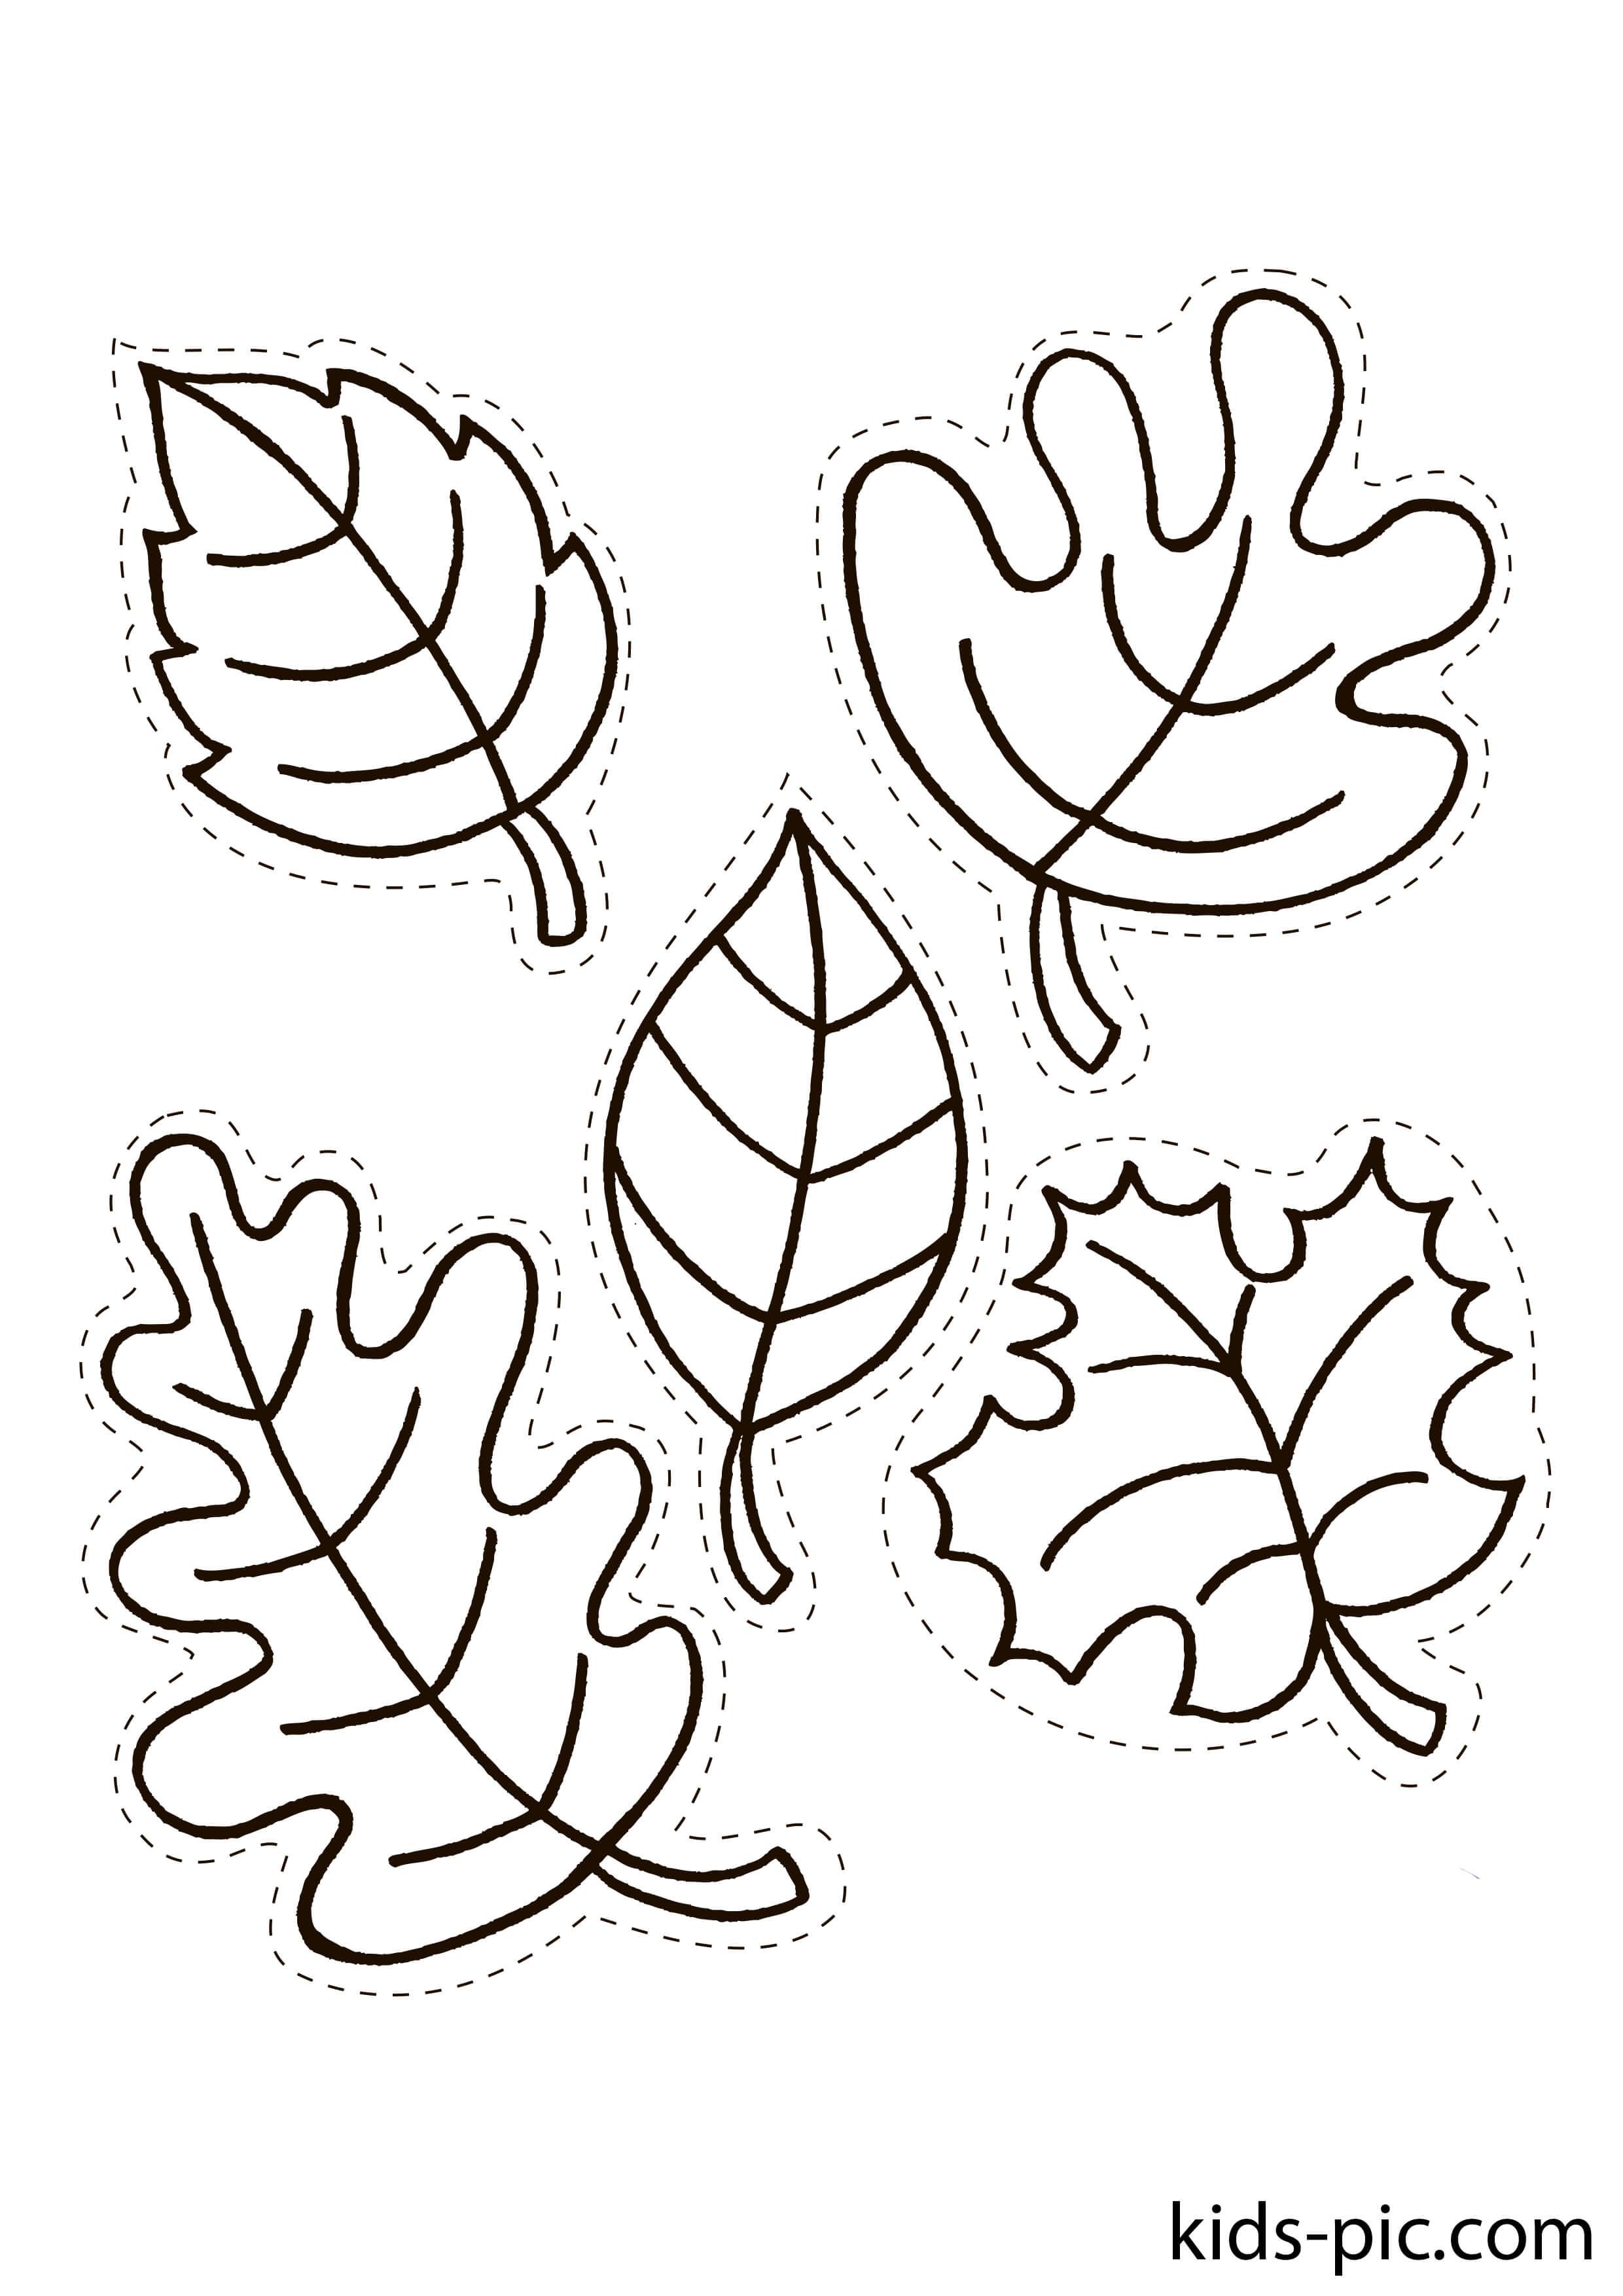 Free Printable Fall Leaves Templates Kids Pic Com